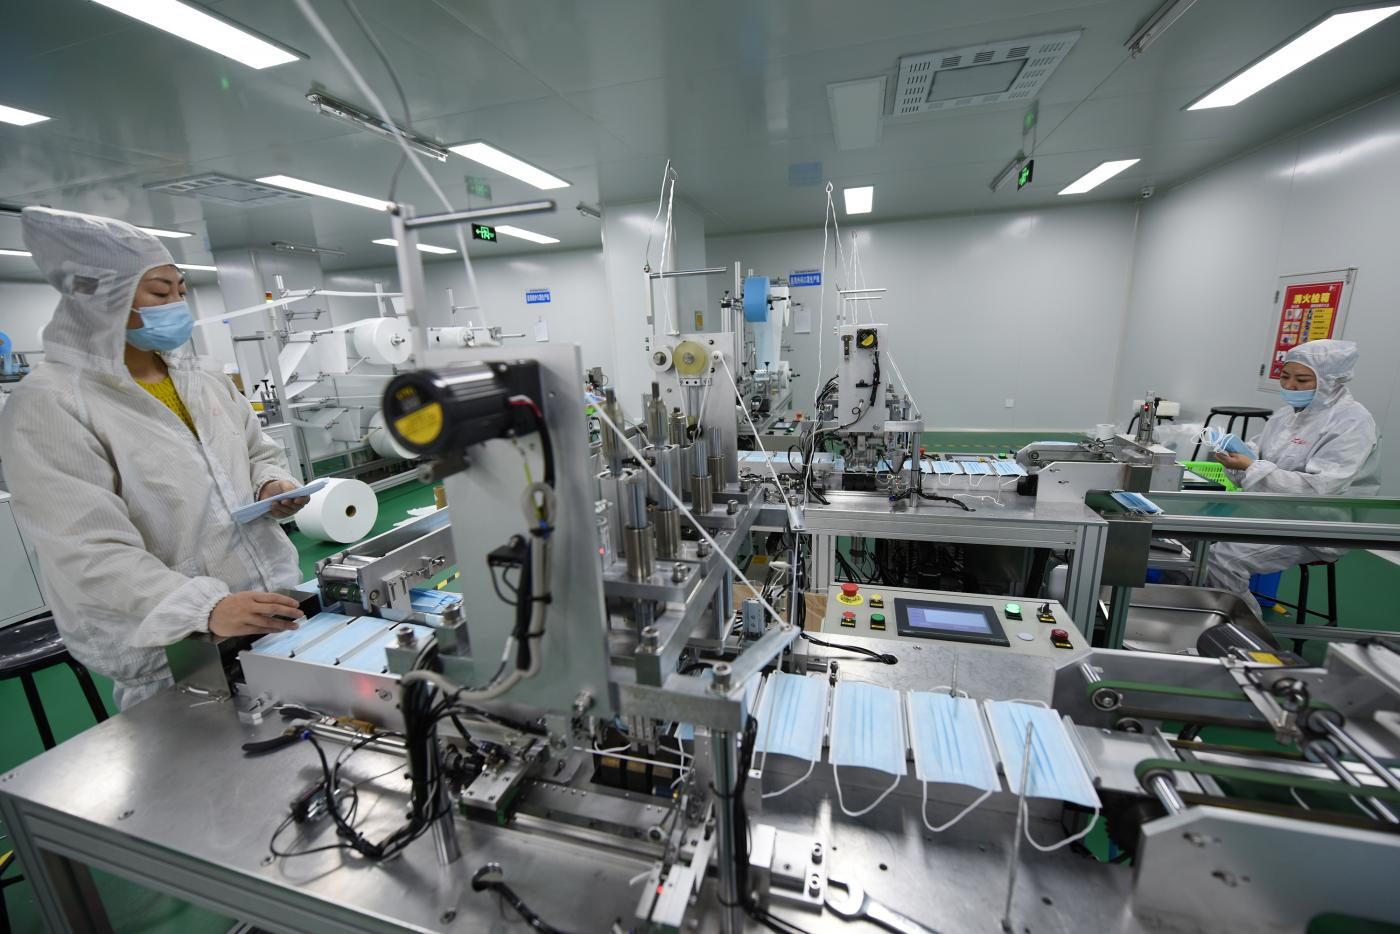 Linea di produzione di mascherine presso un'azienda di forniture mediche in provincia di Hebei in Cina